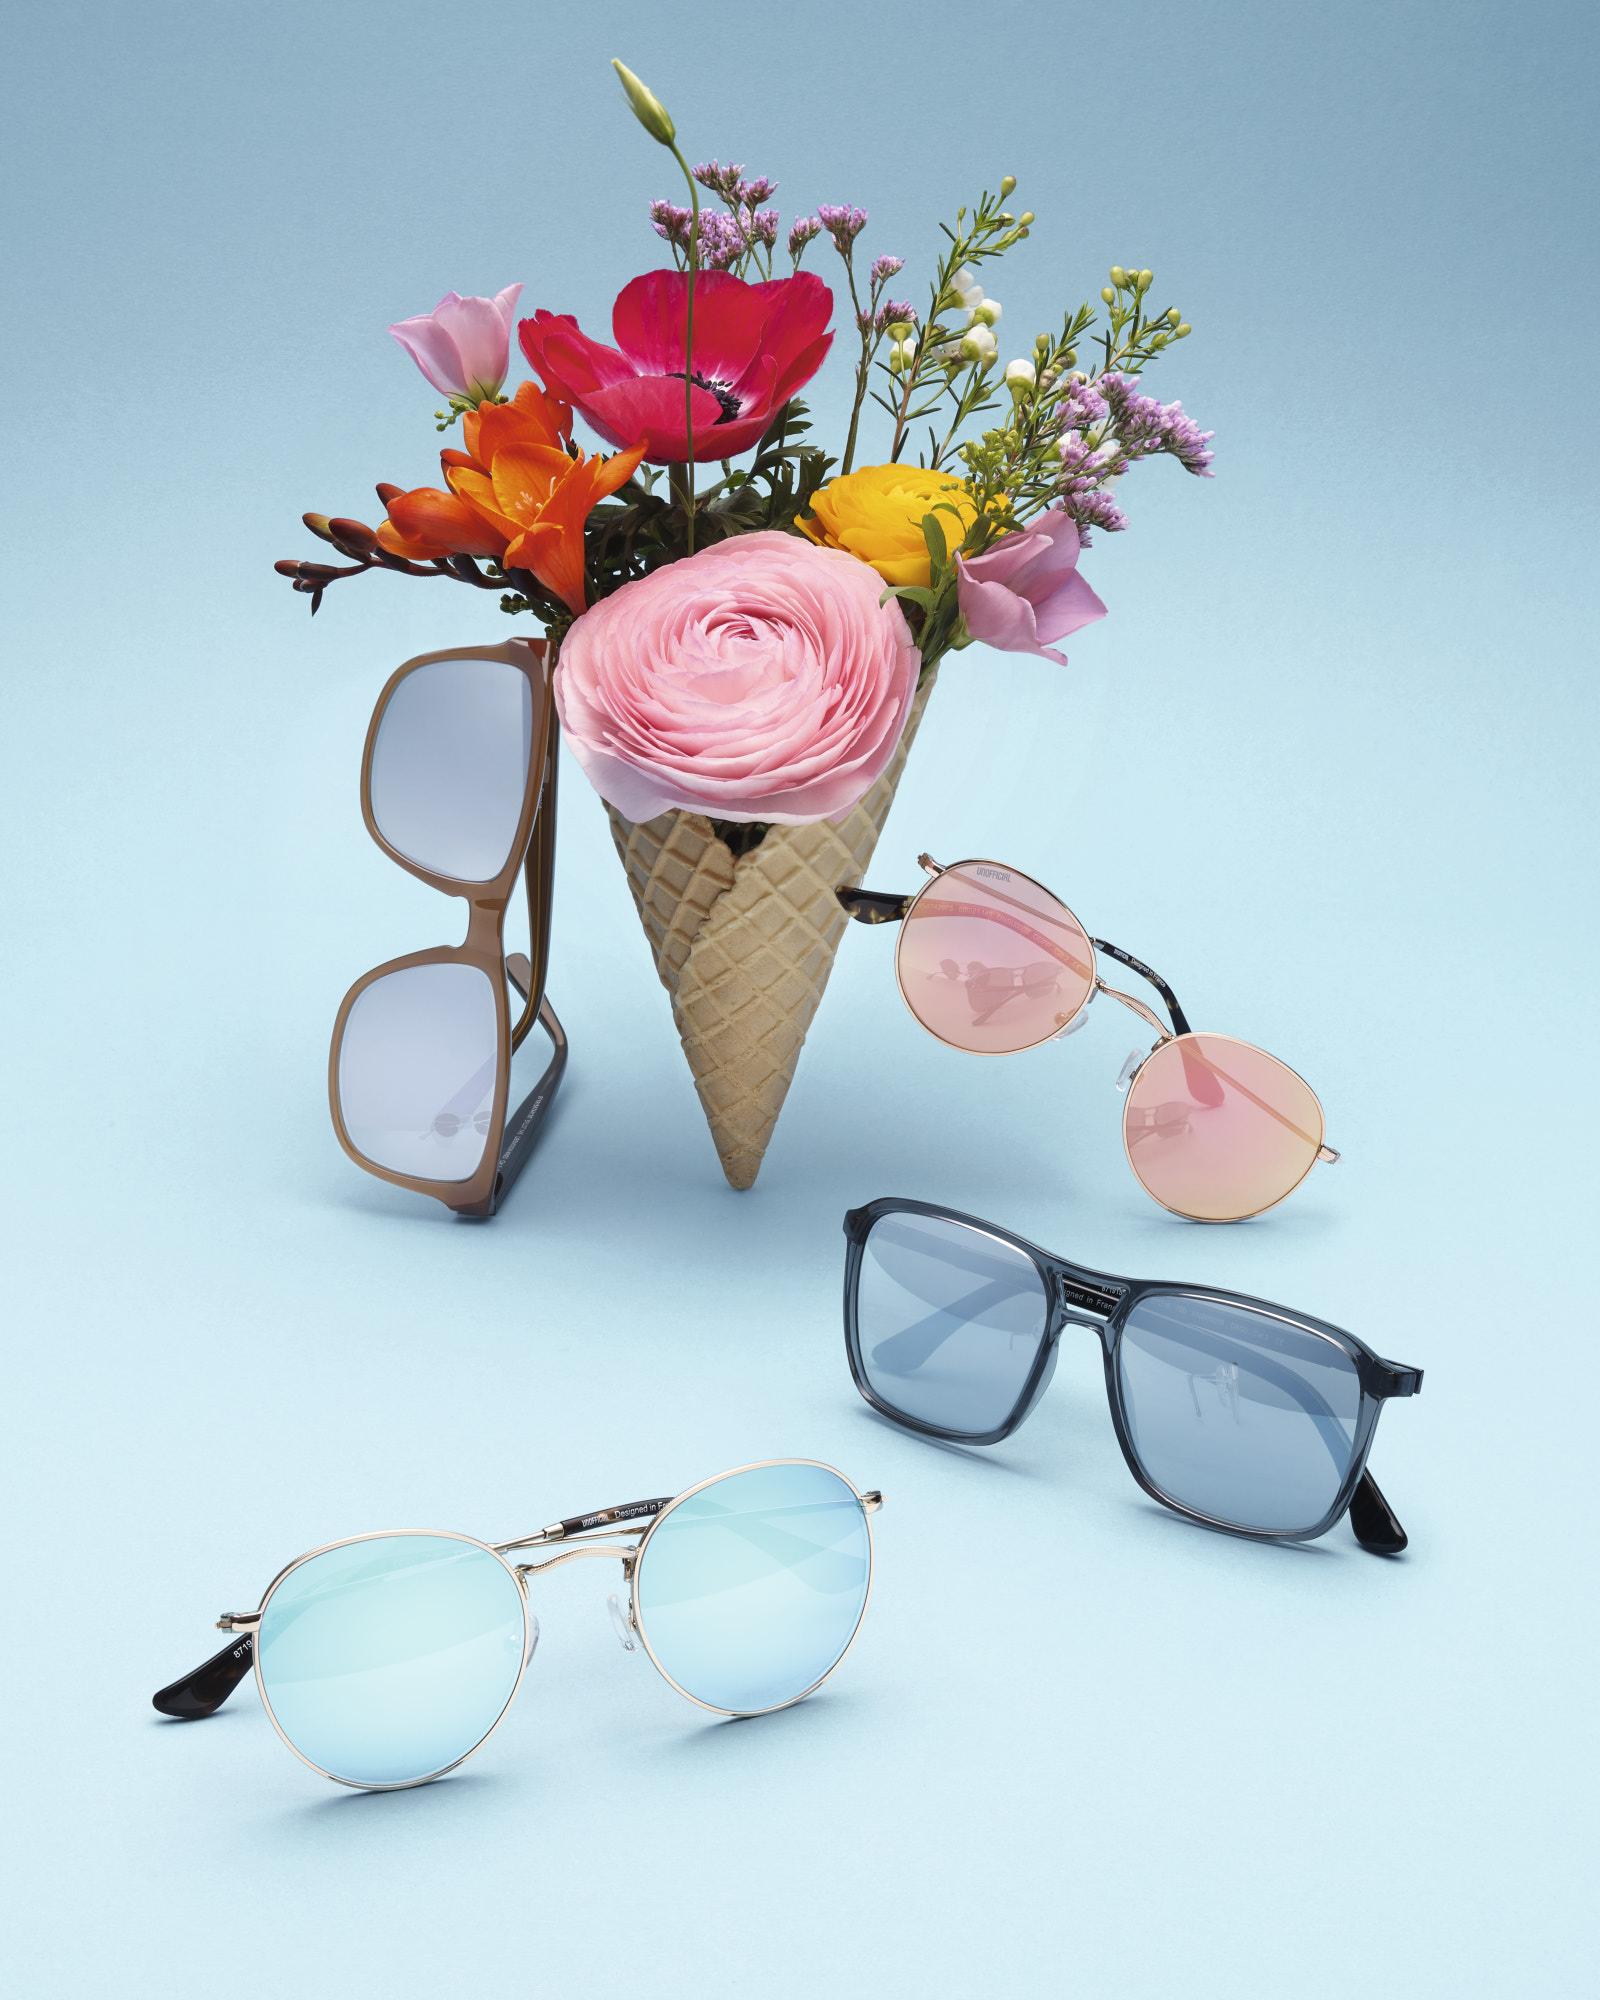 bernd-westphal-stillstars-apollo-optik-sunglasses-still-life-photography-004